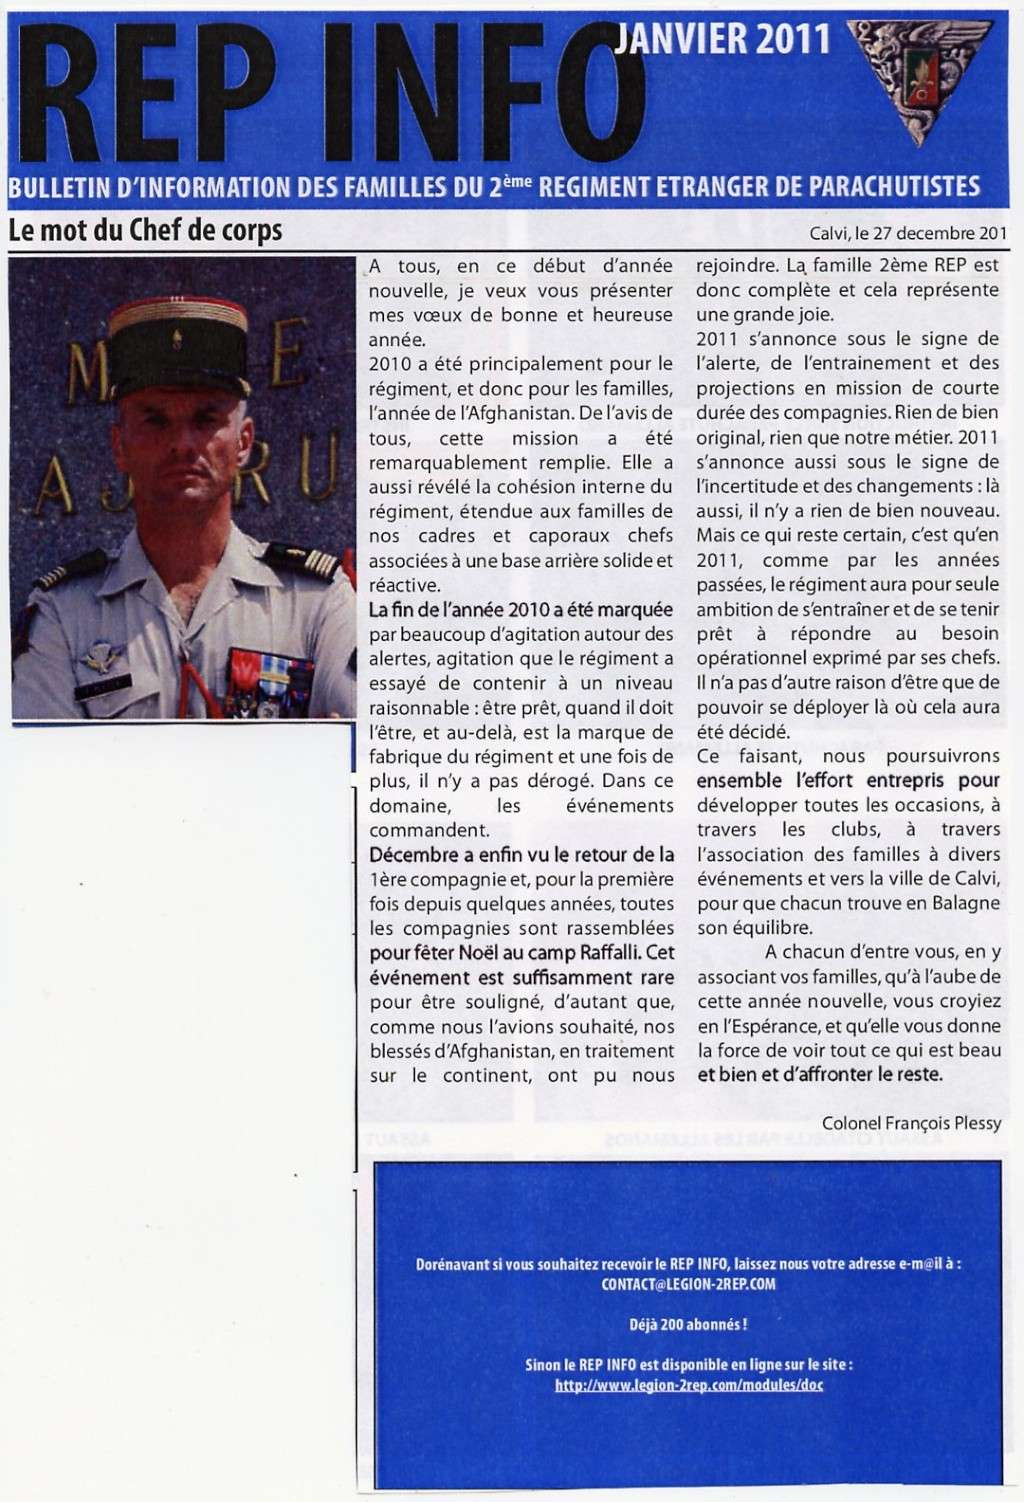 REP INFO JANVIER 2011 LEGION ETRANGERE File0519